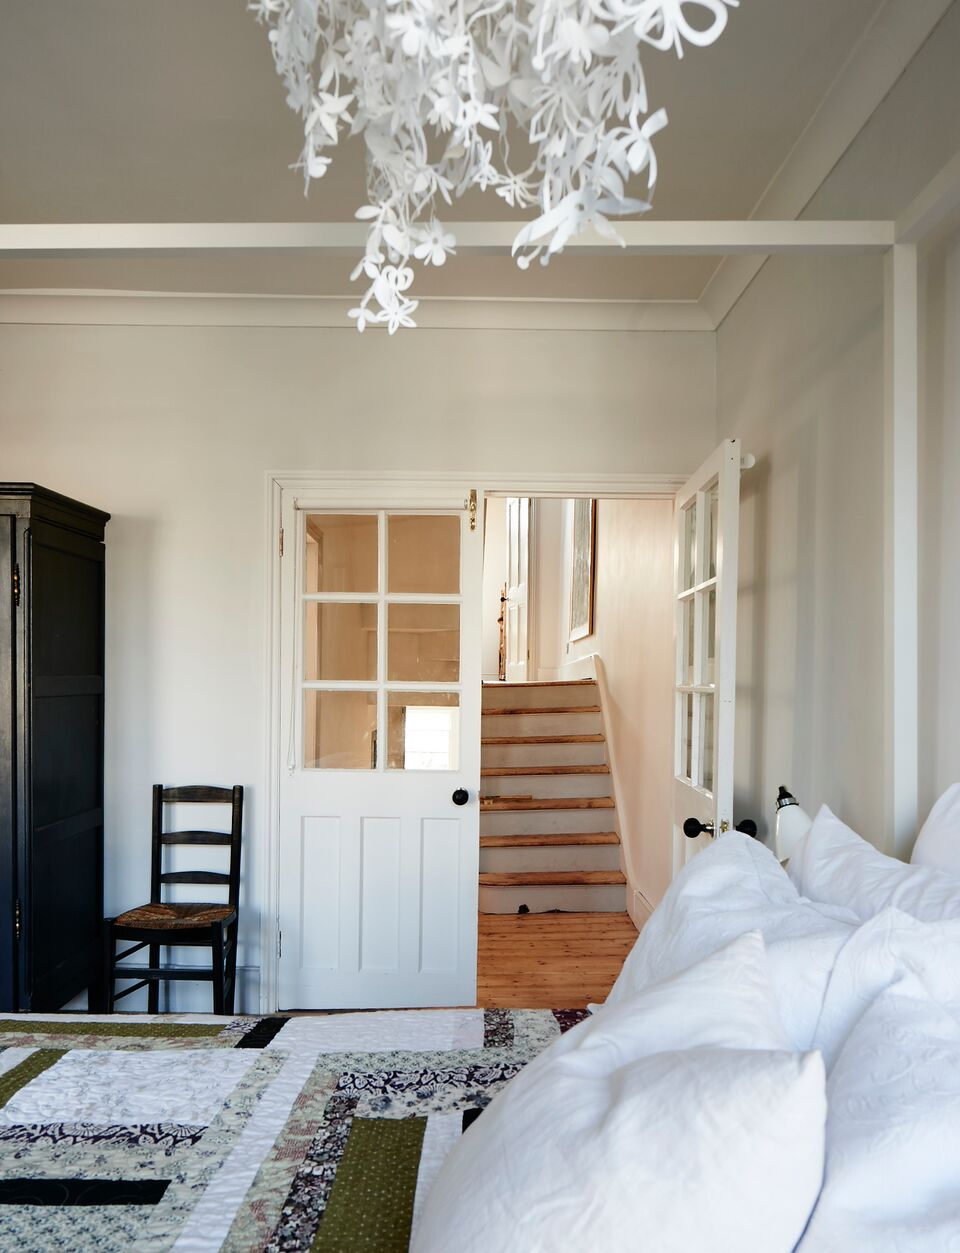 cassandra-ellis-peckham-house-hallway.jpg